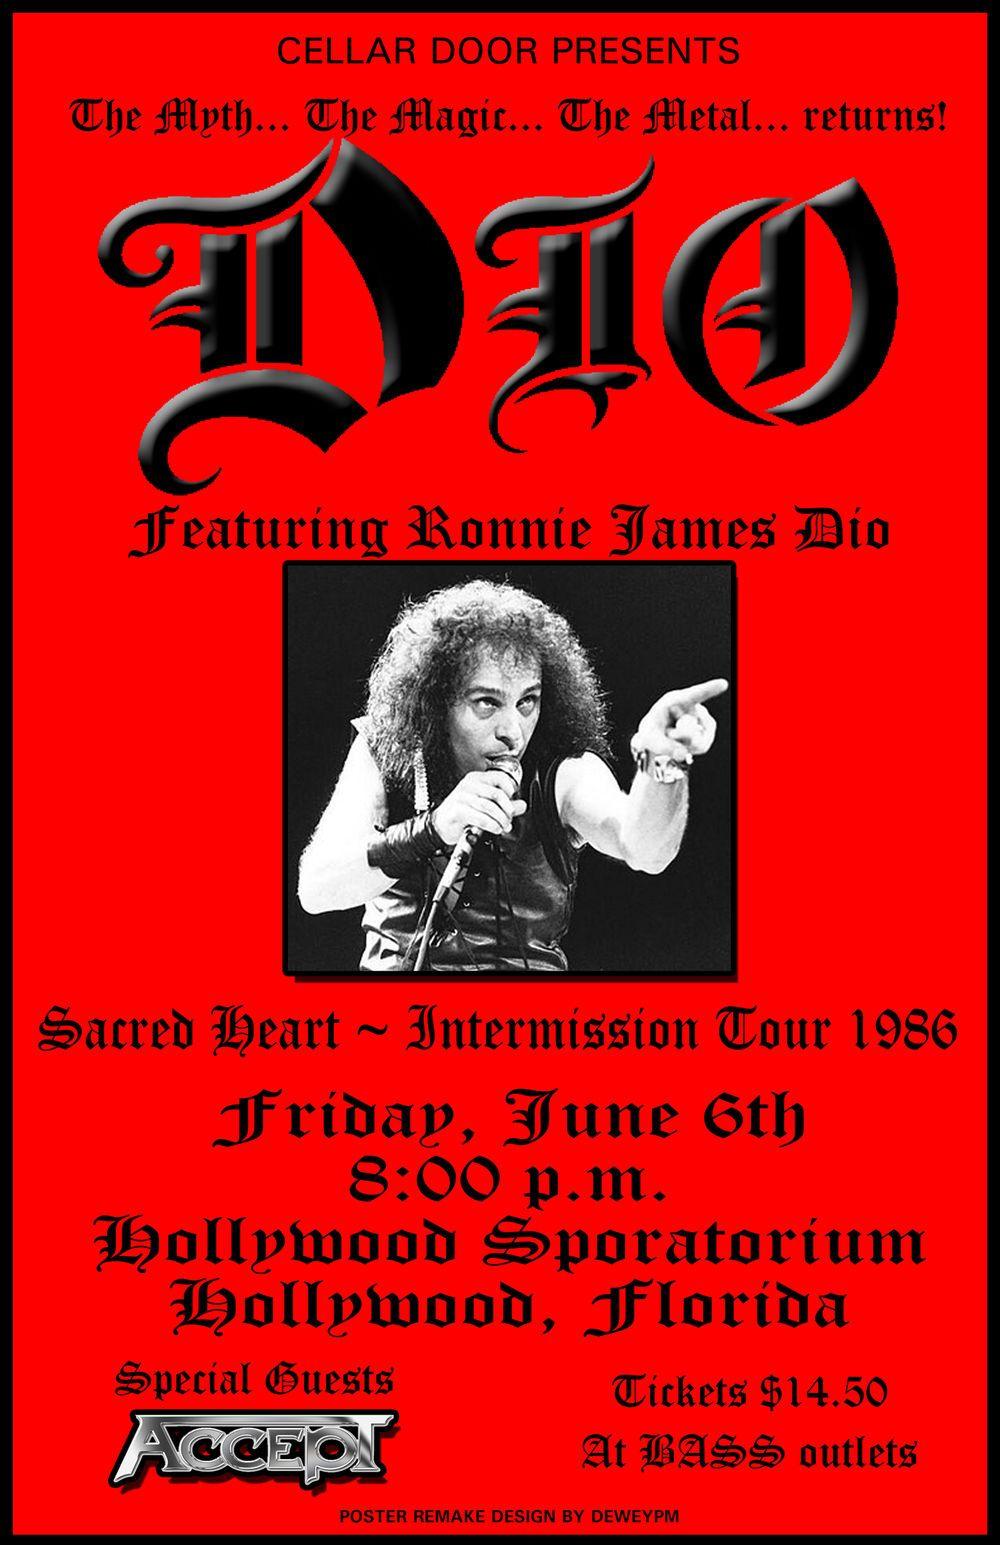 Classic Rock Concert Posters